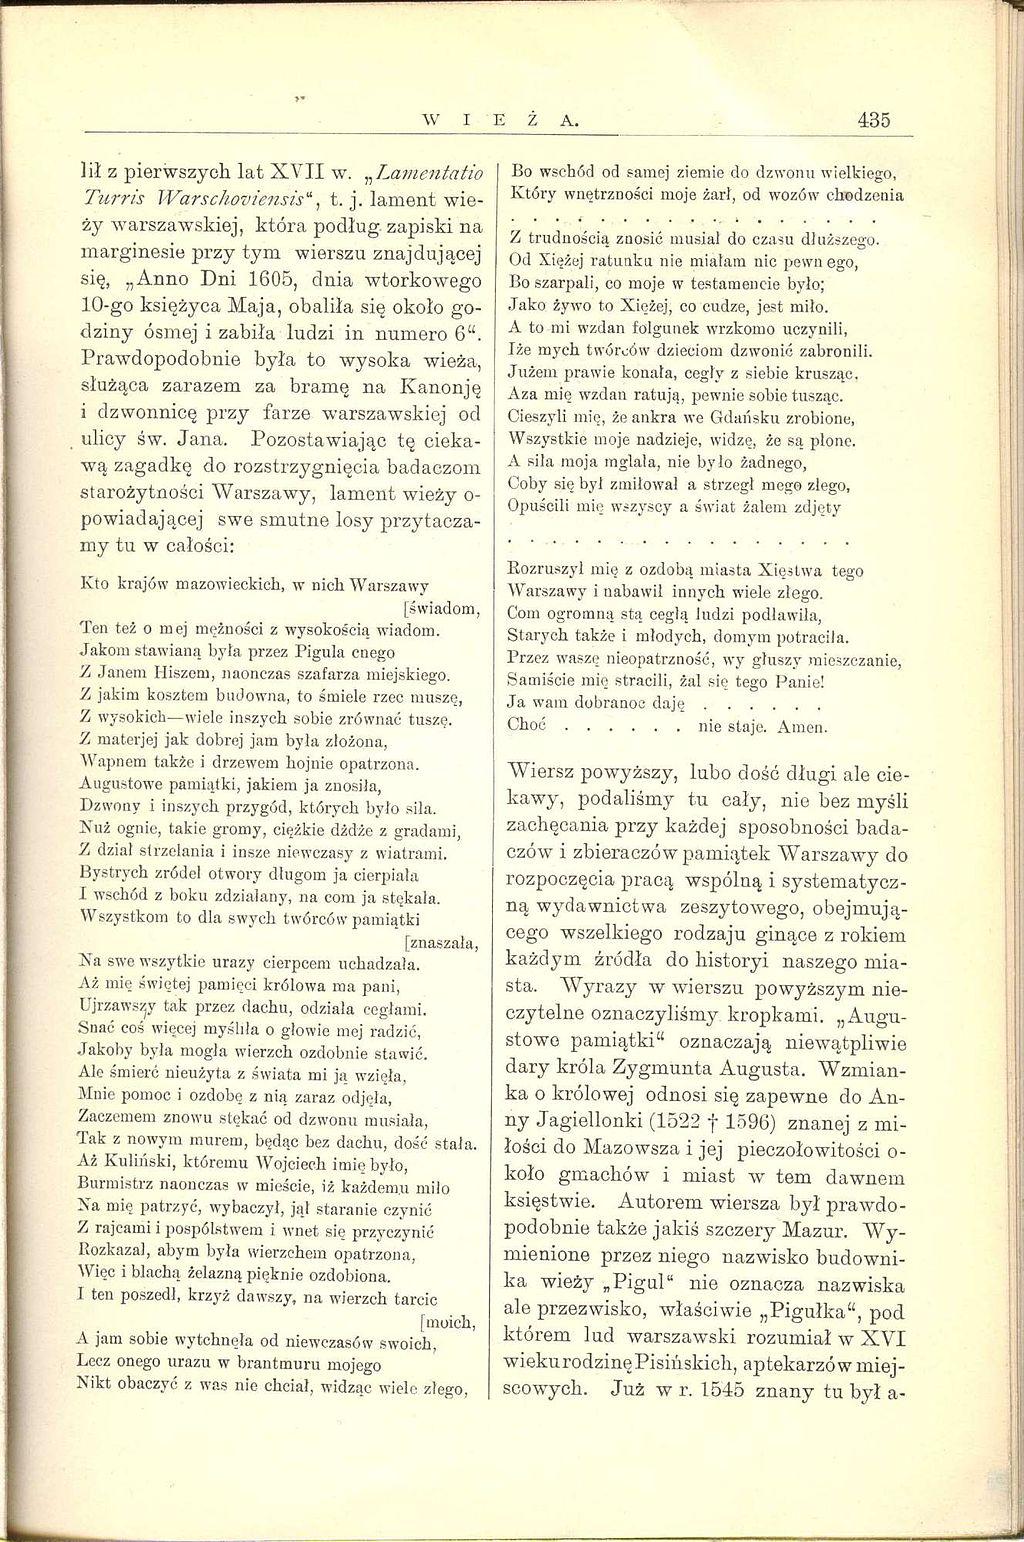 Stronapl Gloger Encyklopedja Staropolska Ilustrowana T4